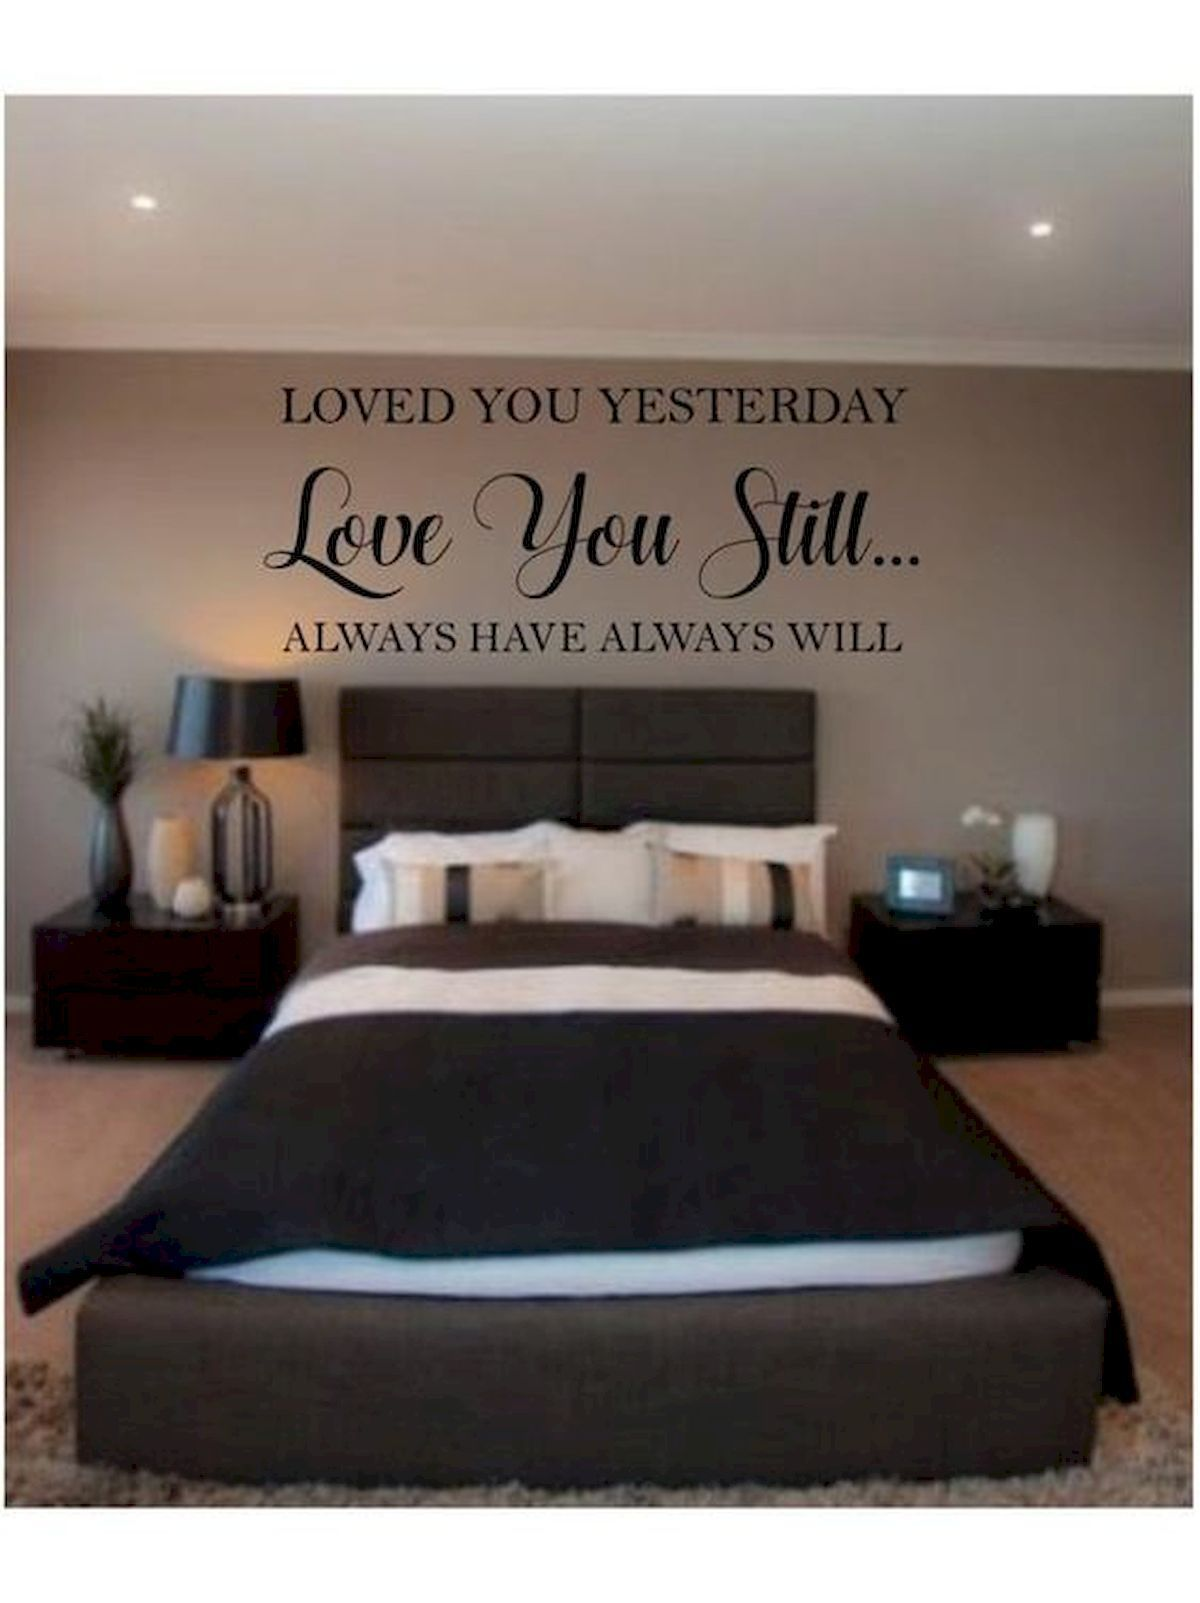 55 Romantic Diy Bedroom Decor For Couple 1 Romantic Bedroom Decor Bedroom Decor For Couples Couples Master Bedroom Bedroom decor for couples